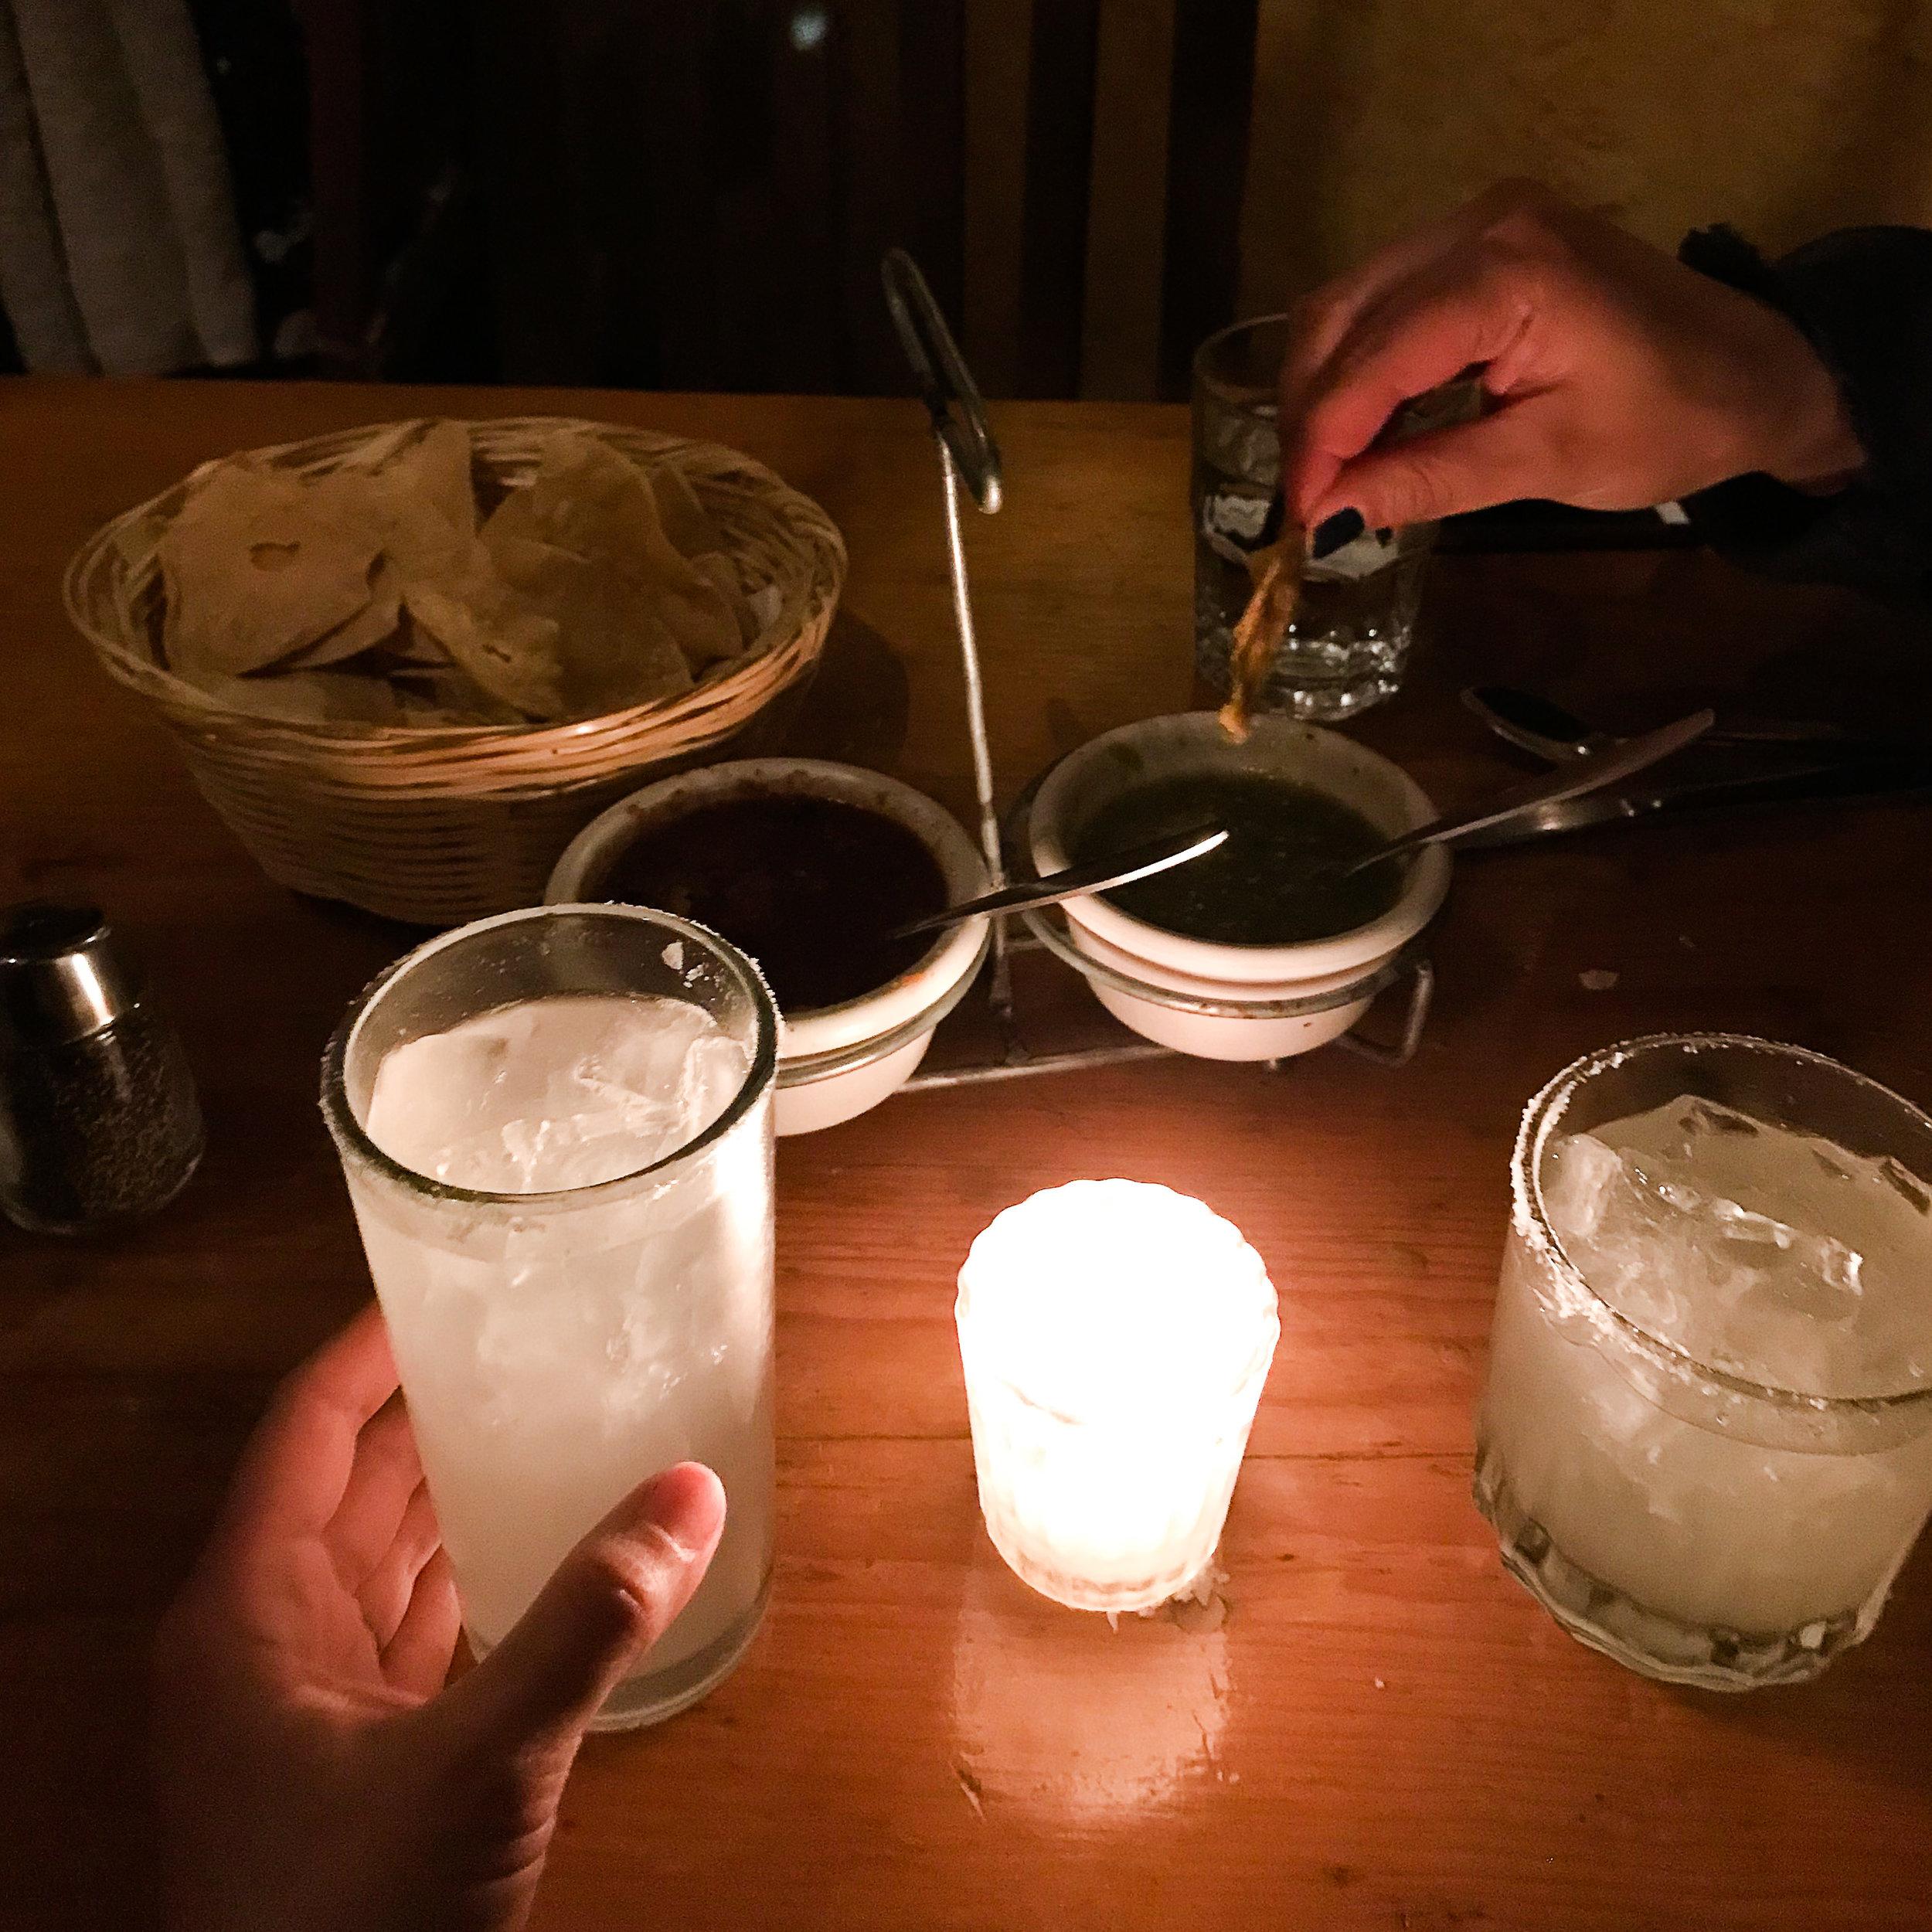 mexican-food-san-miguel-de-allende-restuarants-coffee-cafes-29.jpg